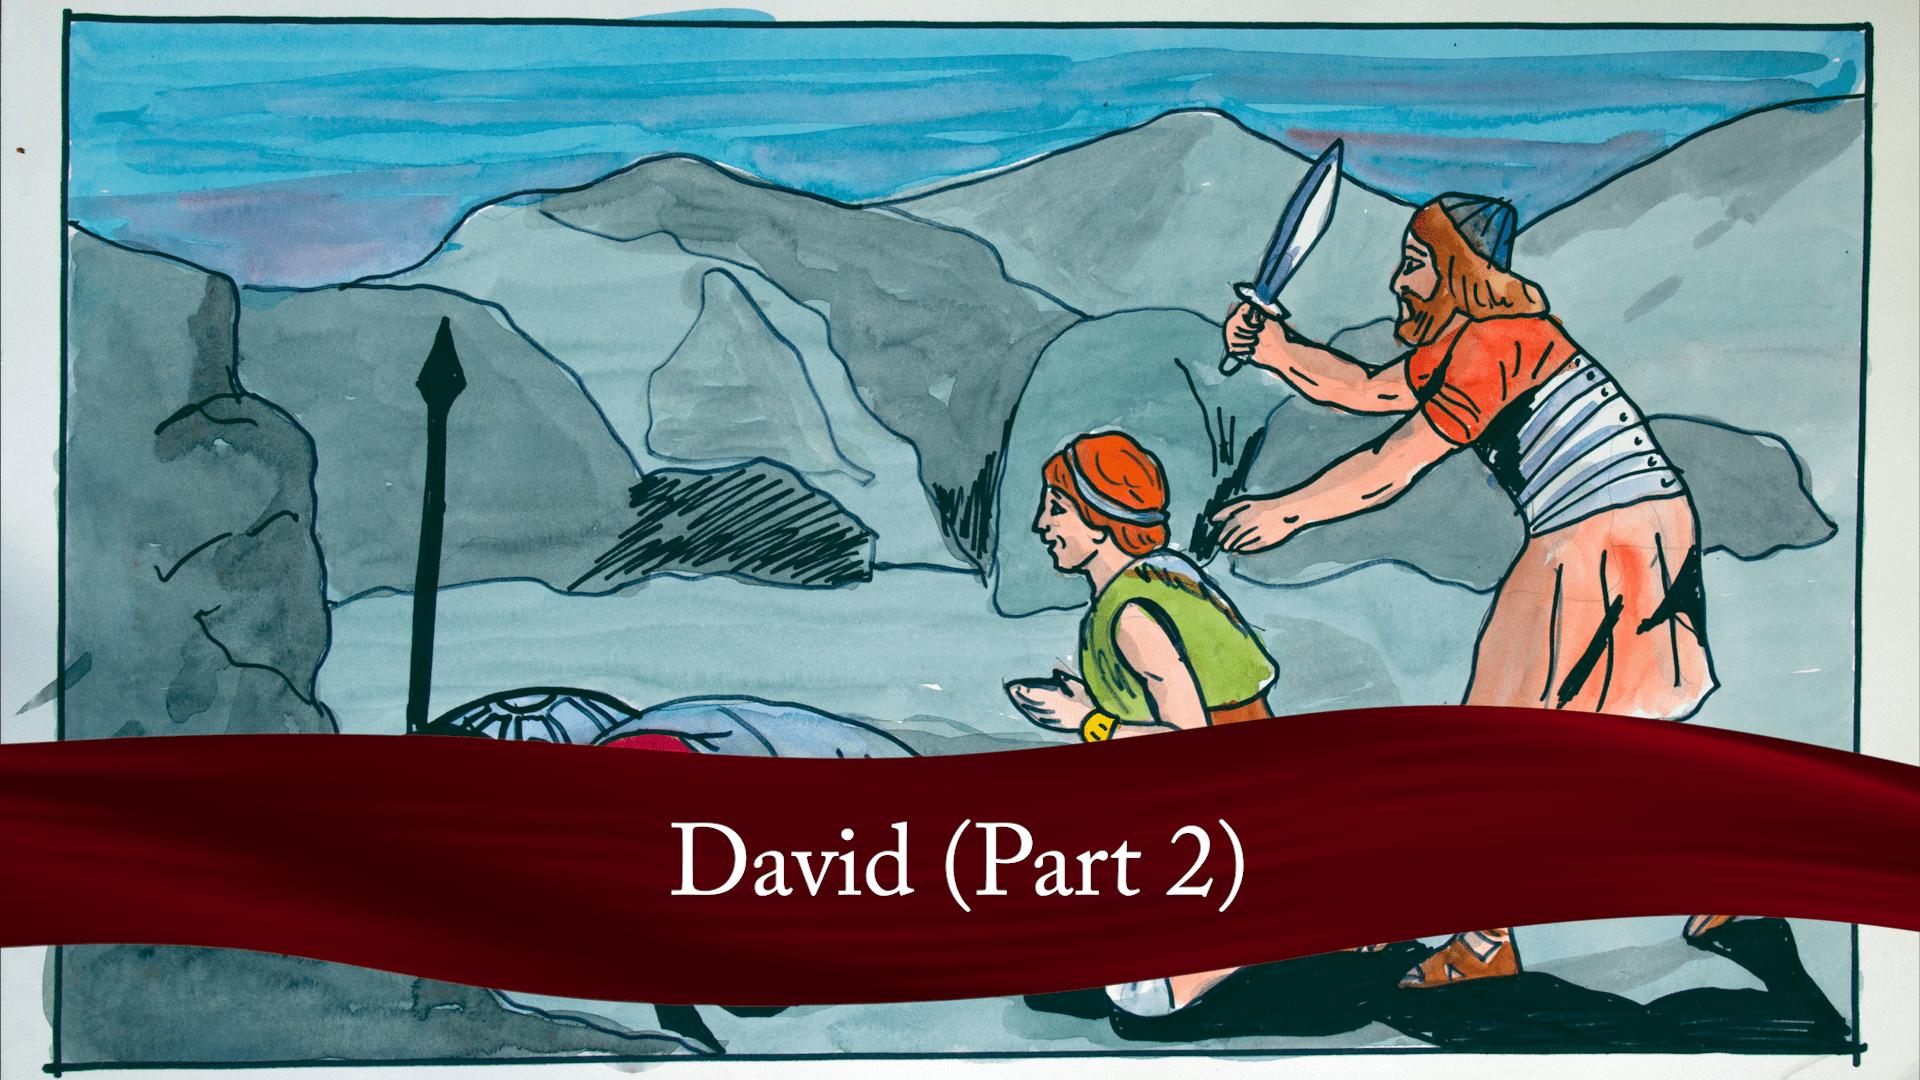 David (Part 2)